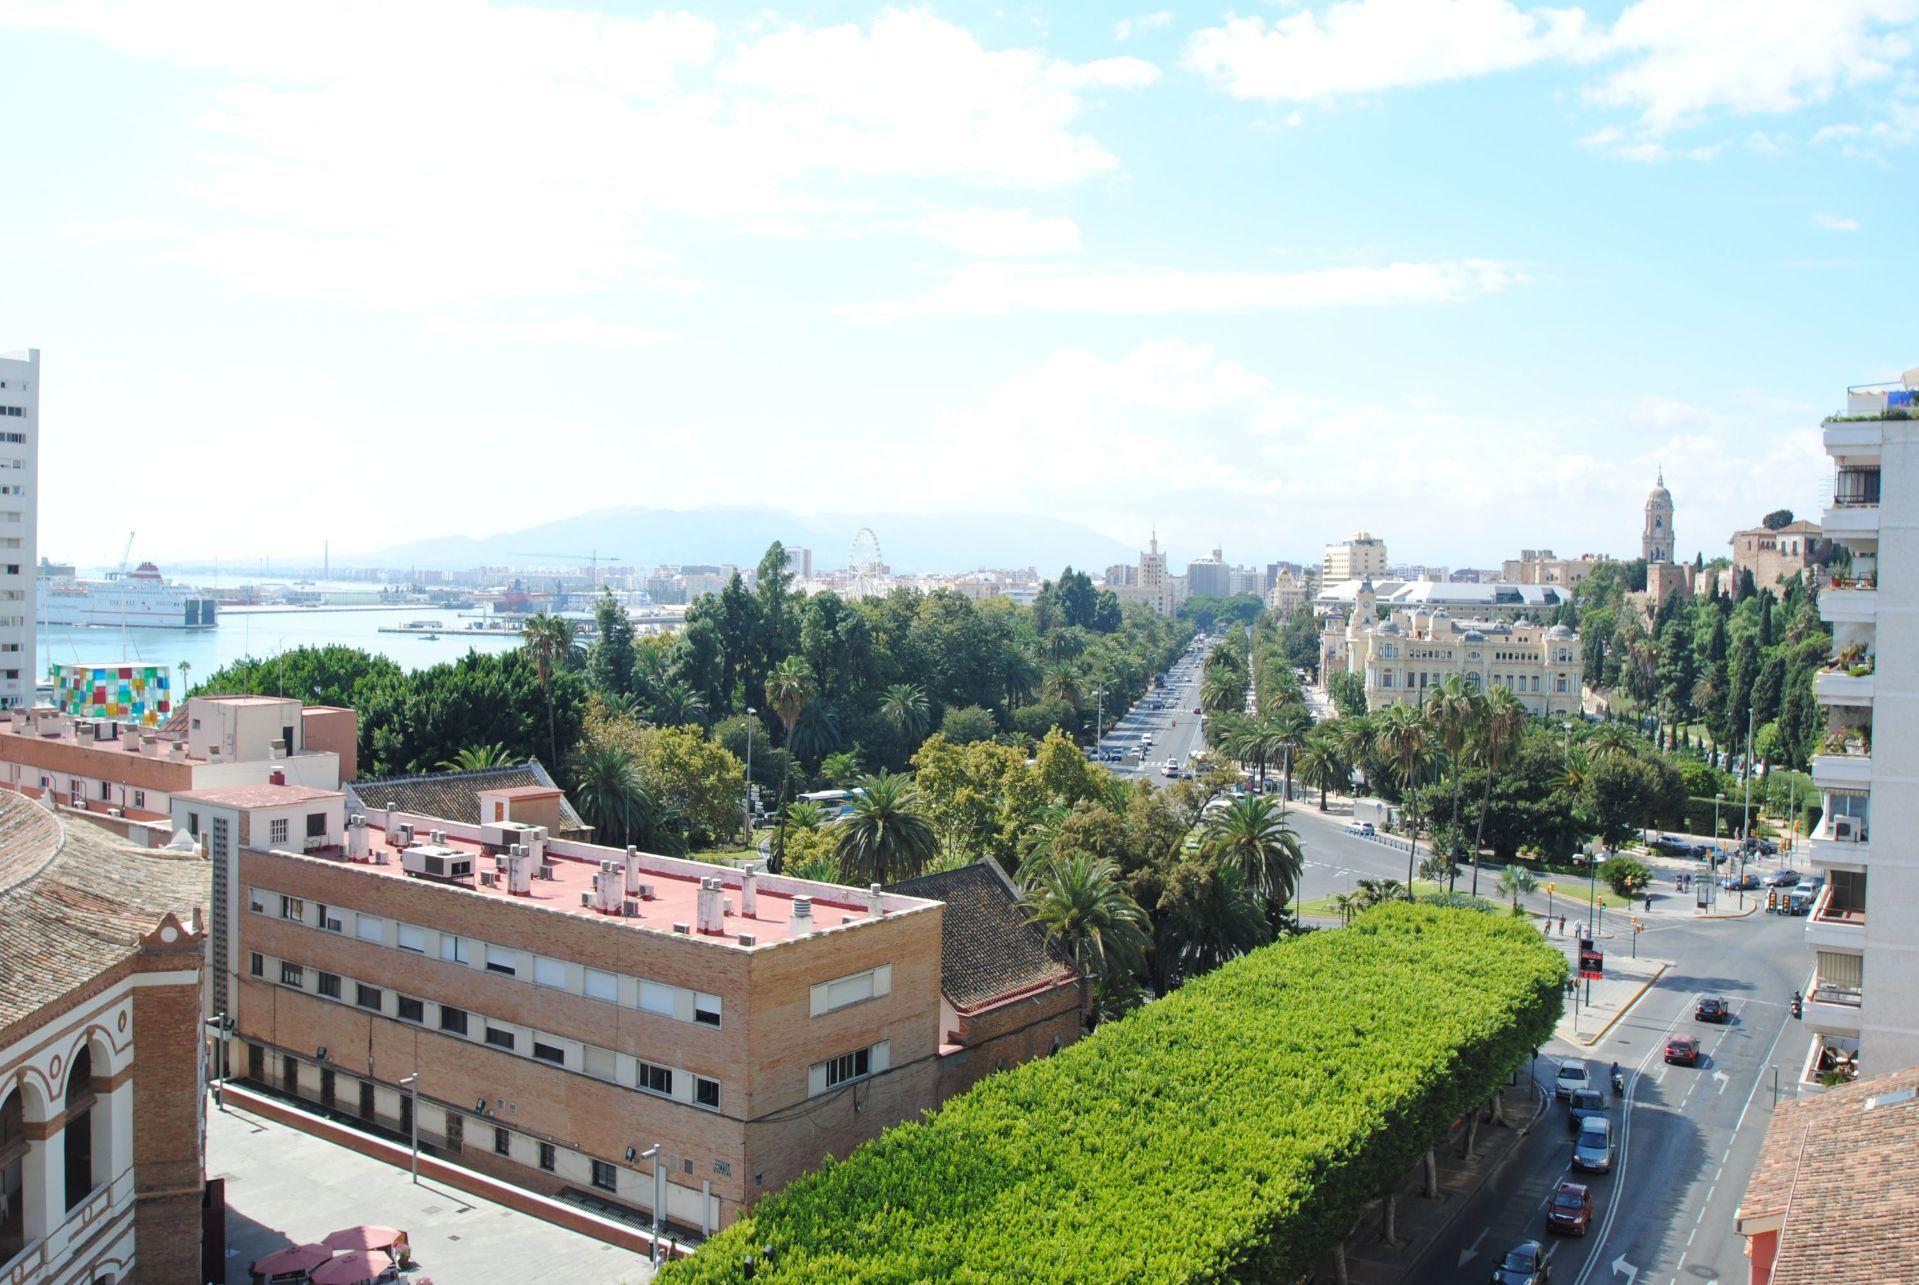 Ático en Málaga, PASEO DE REDING, venta